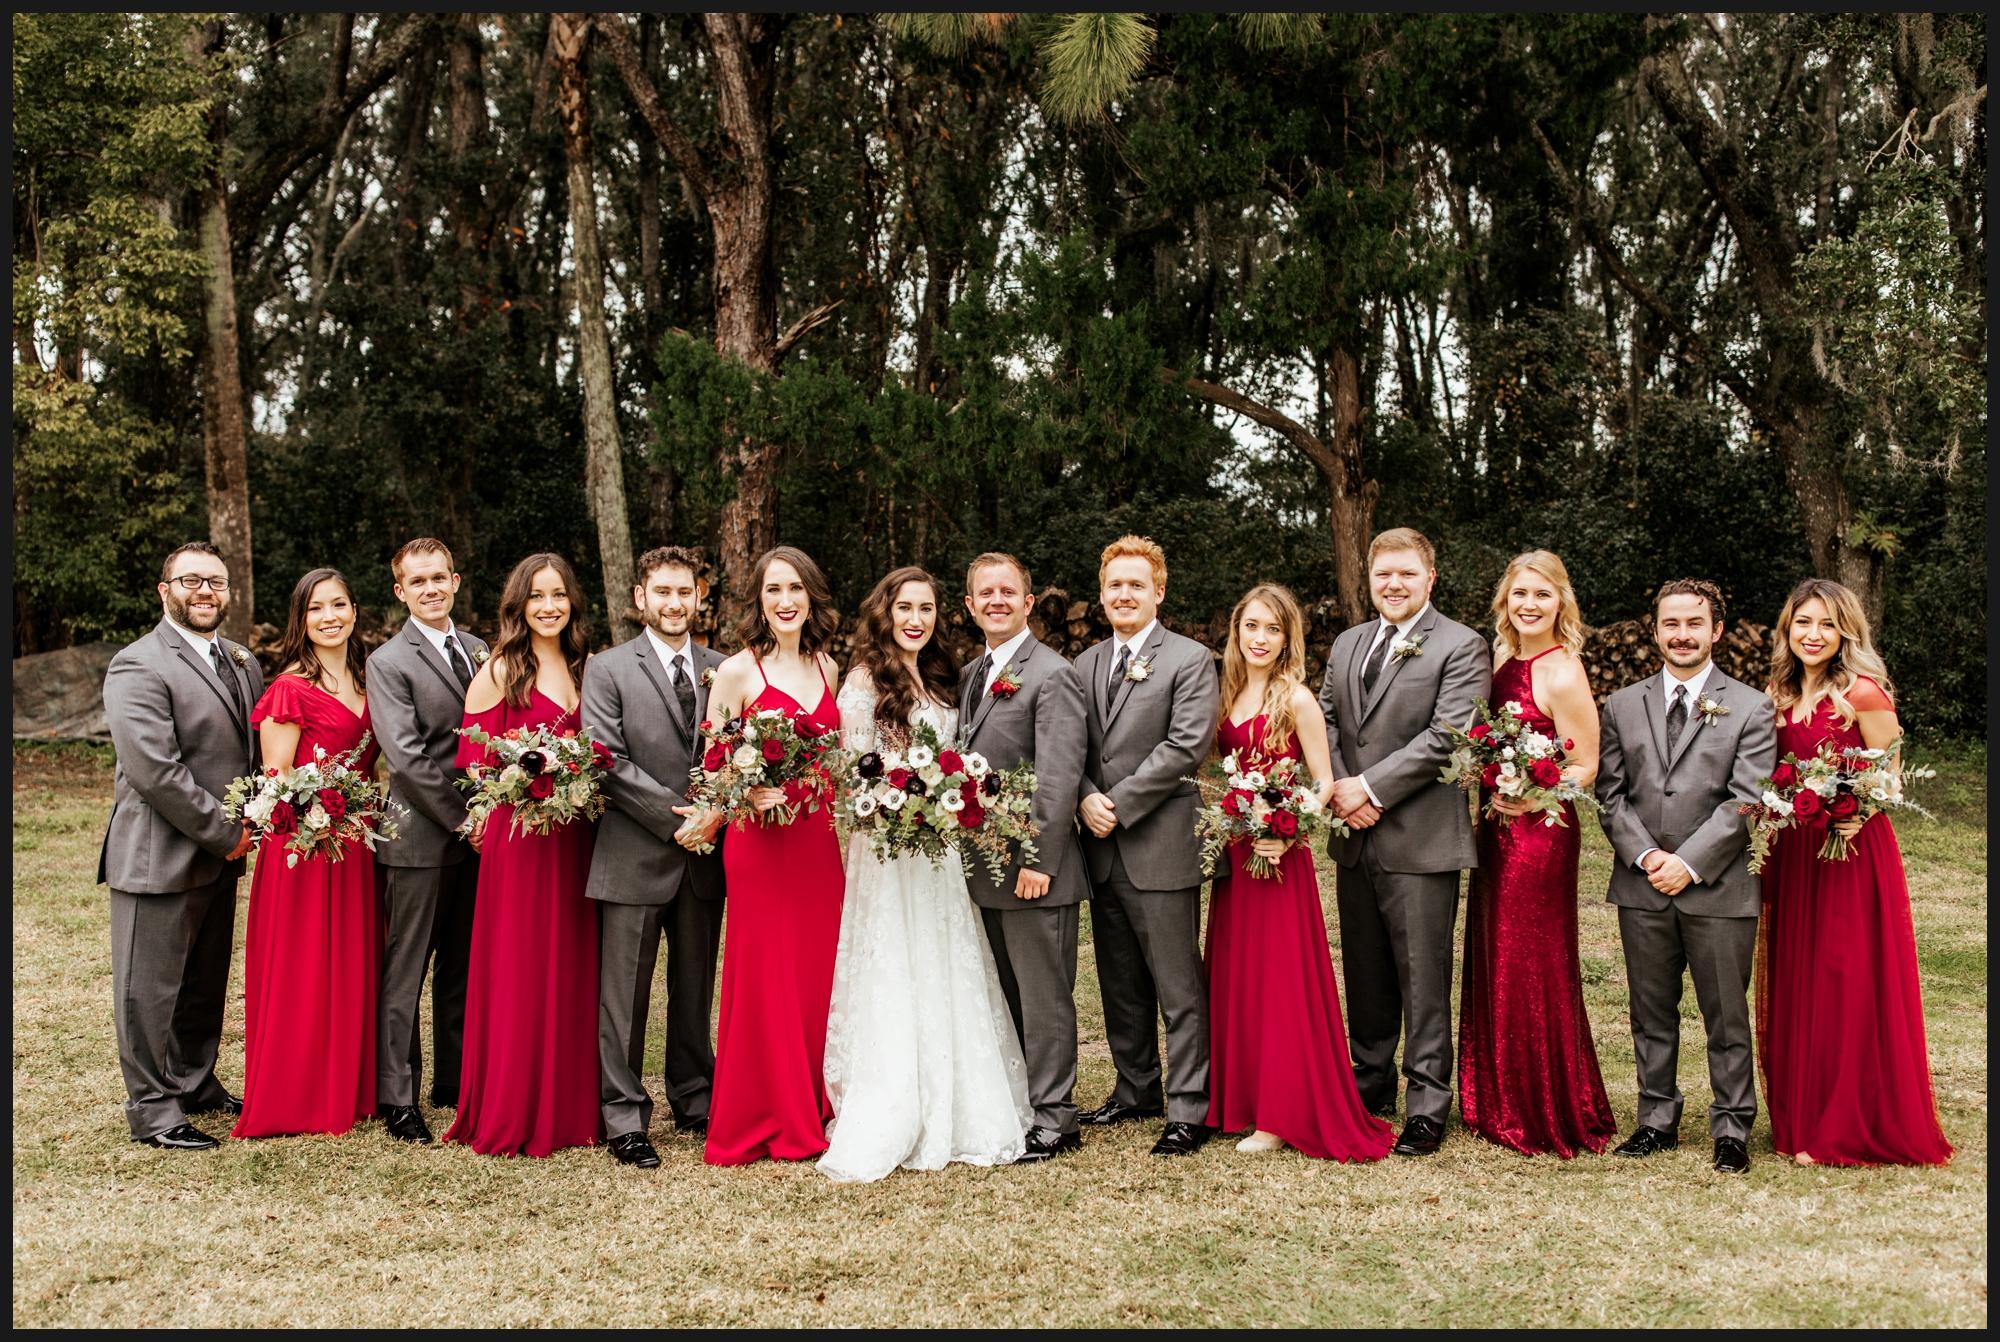 Orlando-Wedding-Photographer-destination-wedding-photographer-florida-wedding-photographer-hawaii-wedding-photographer_0513.jpg